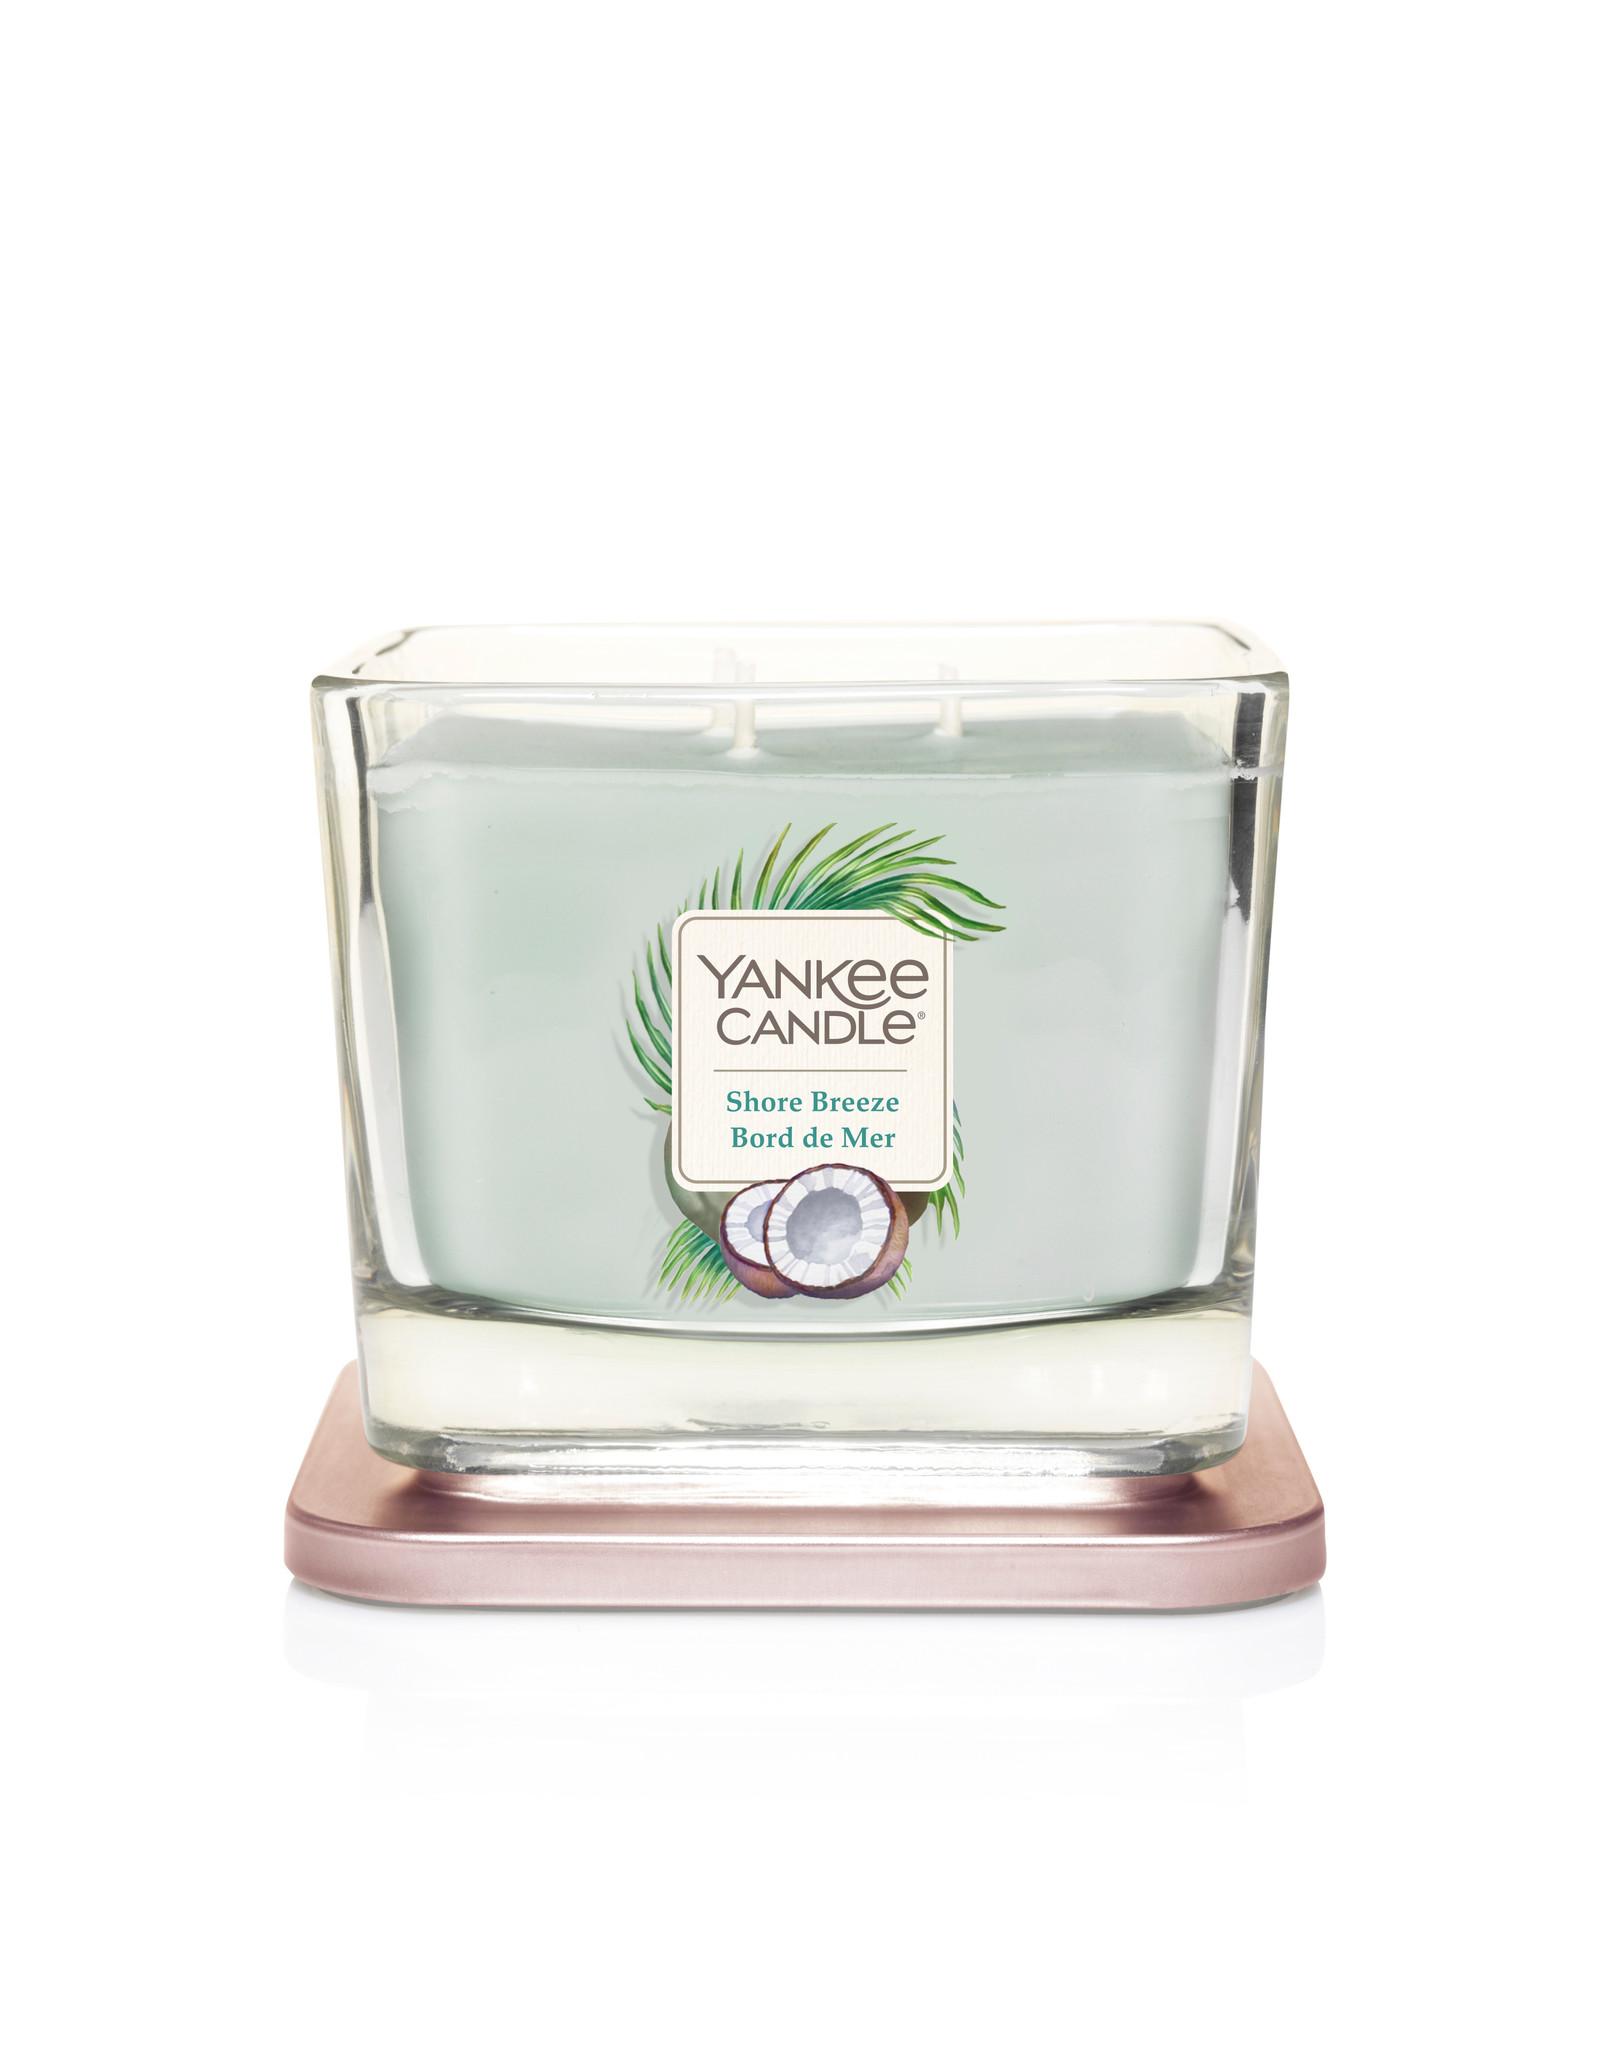 Yankee Candle Shore Breeze - Medium Vessel